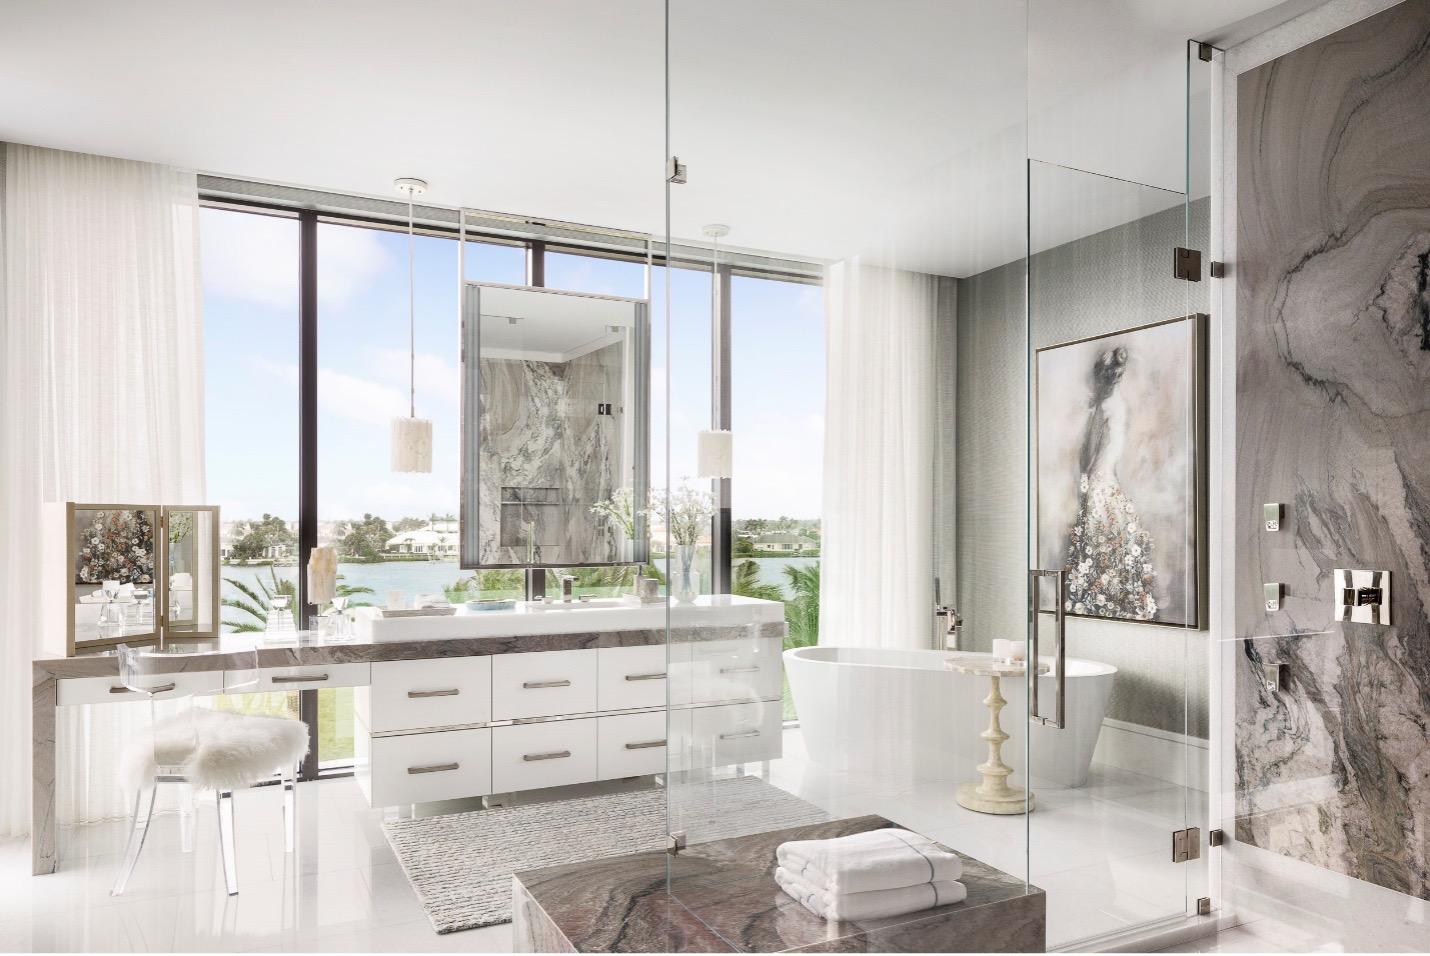 Luxury Interior Design details